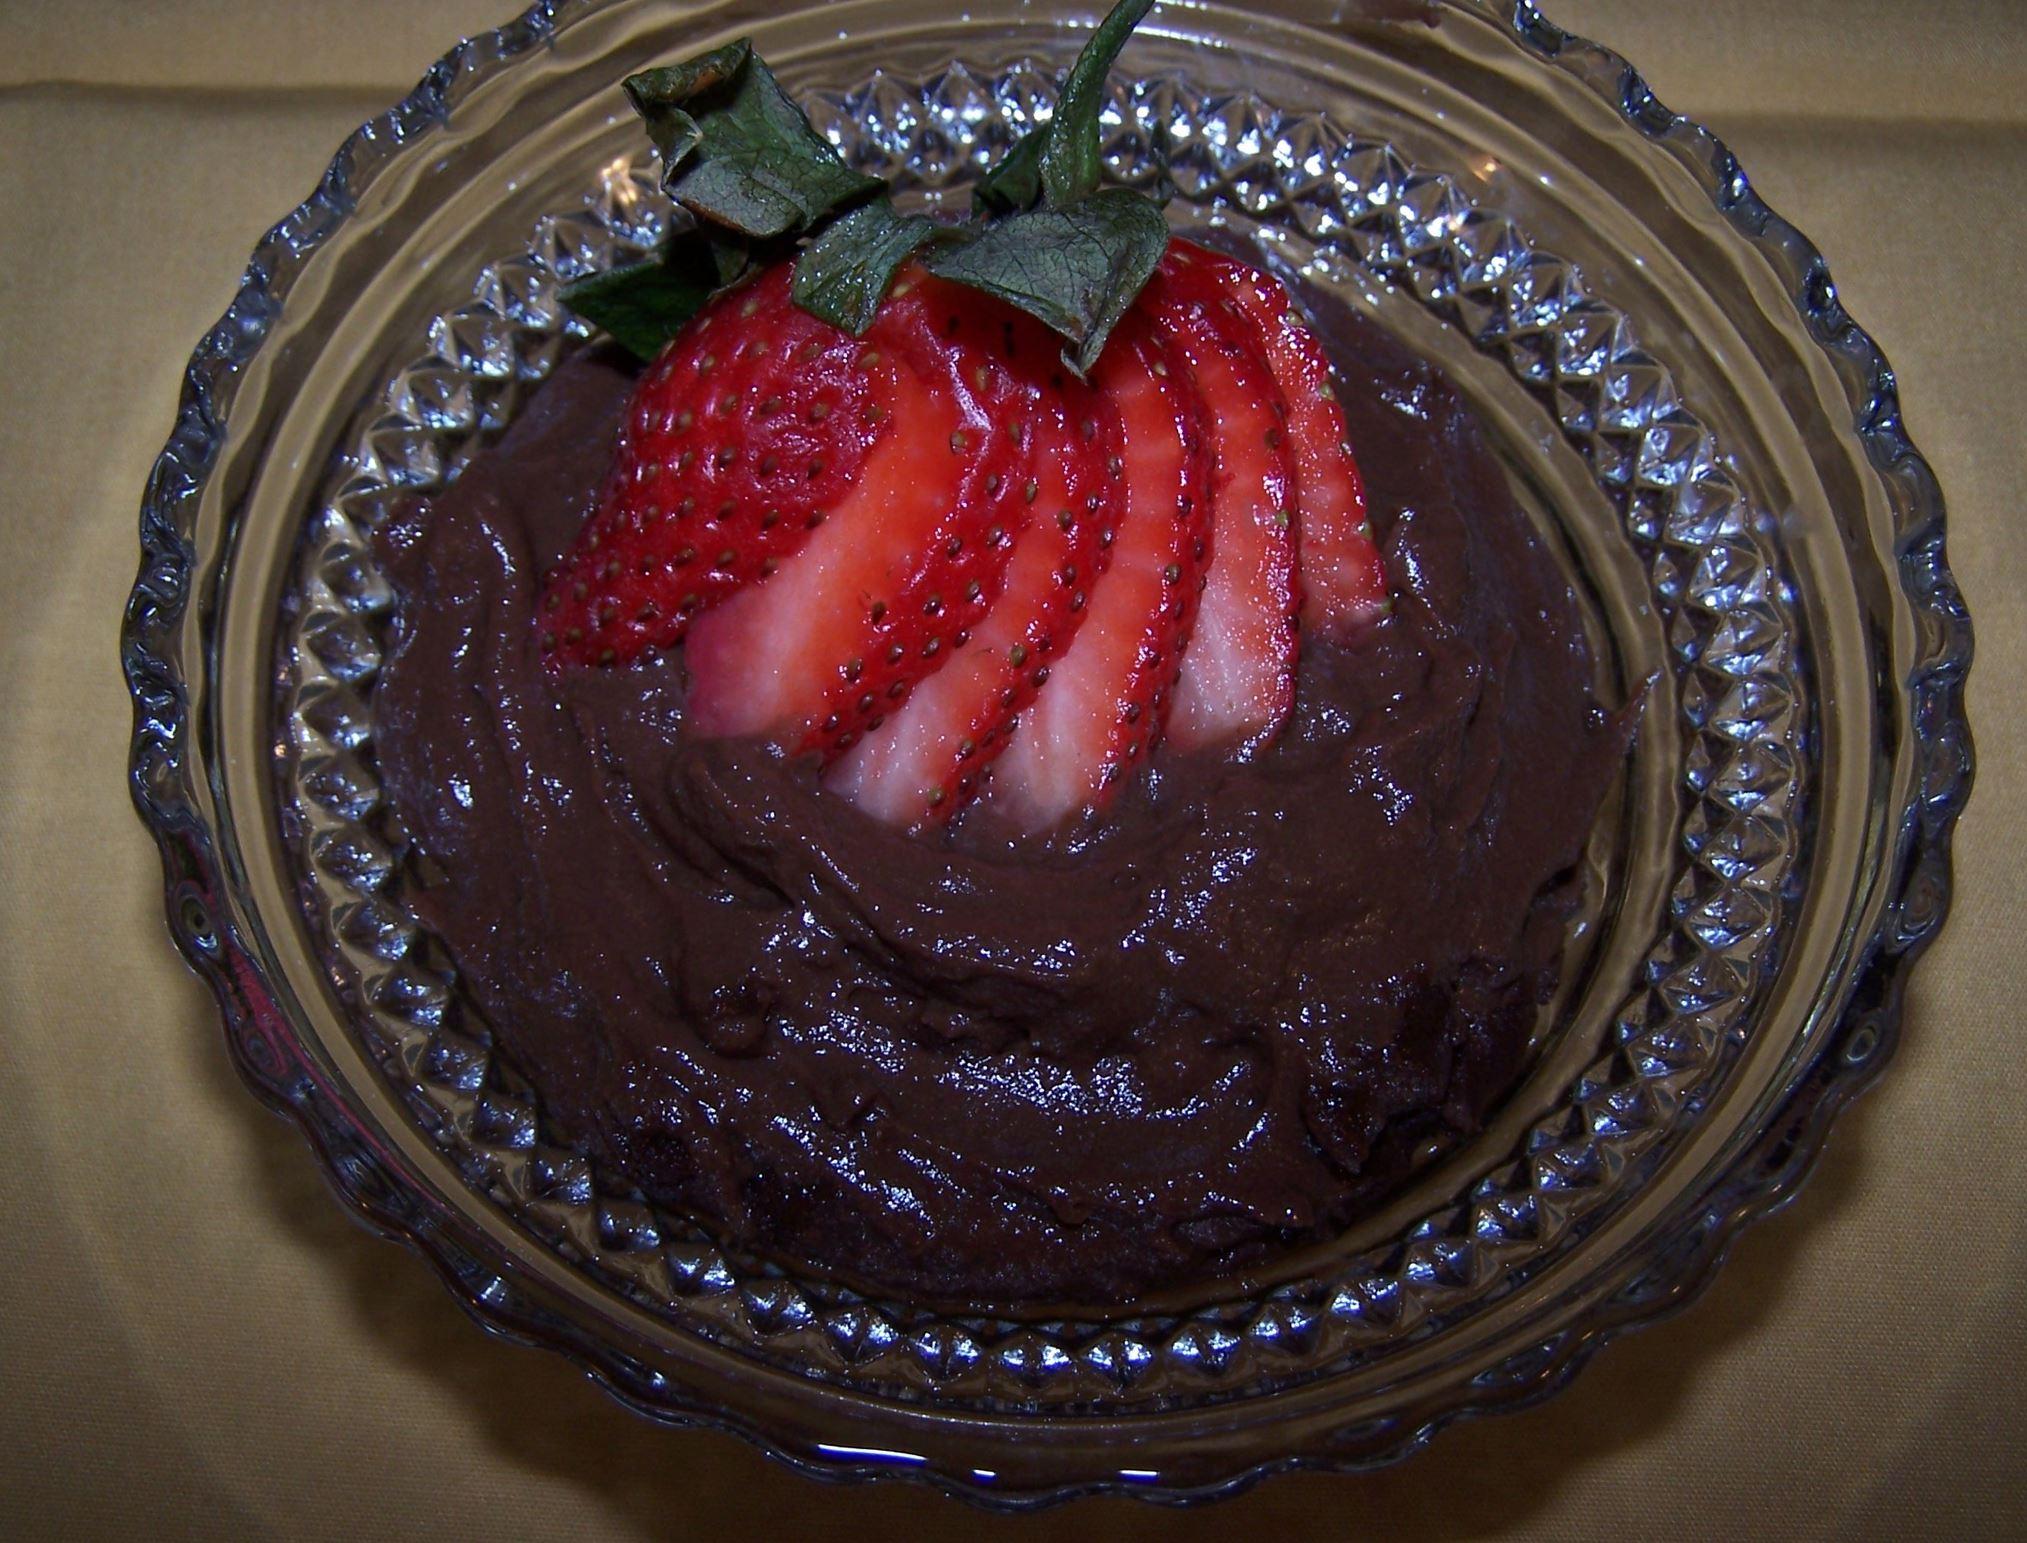 20140210hoBSpuddinfood-1 2 shots of Chocolate Pudding.